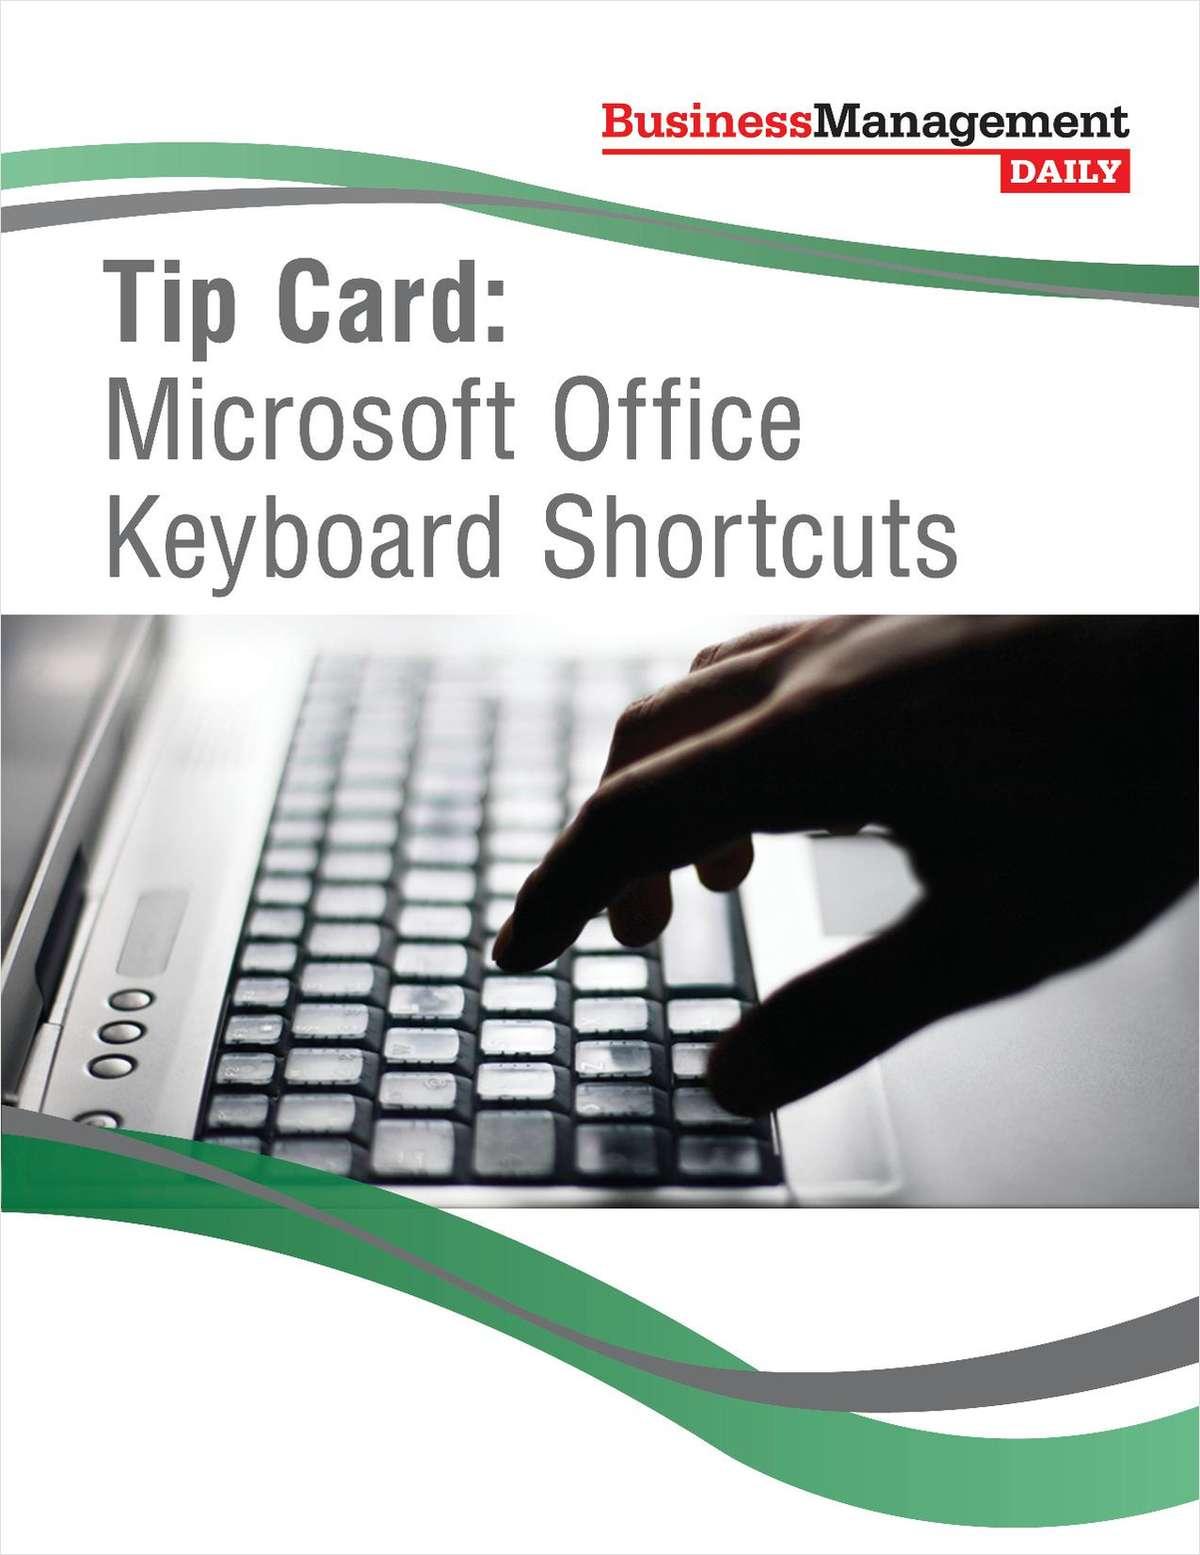 Tip Card: Microsoft Office Keyboard Shortcuts